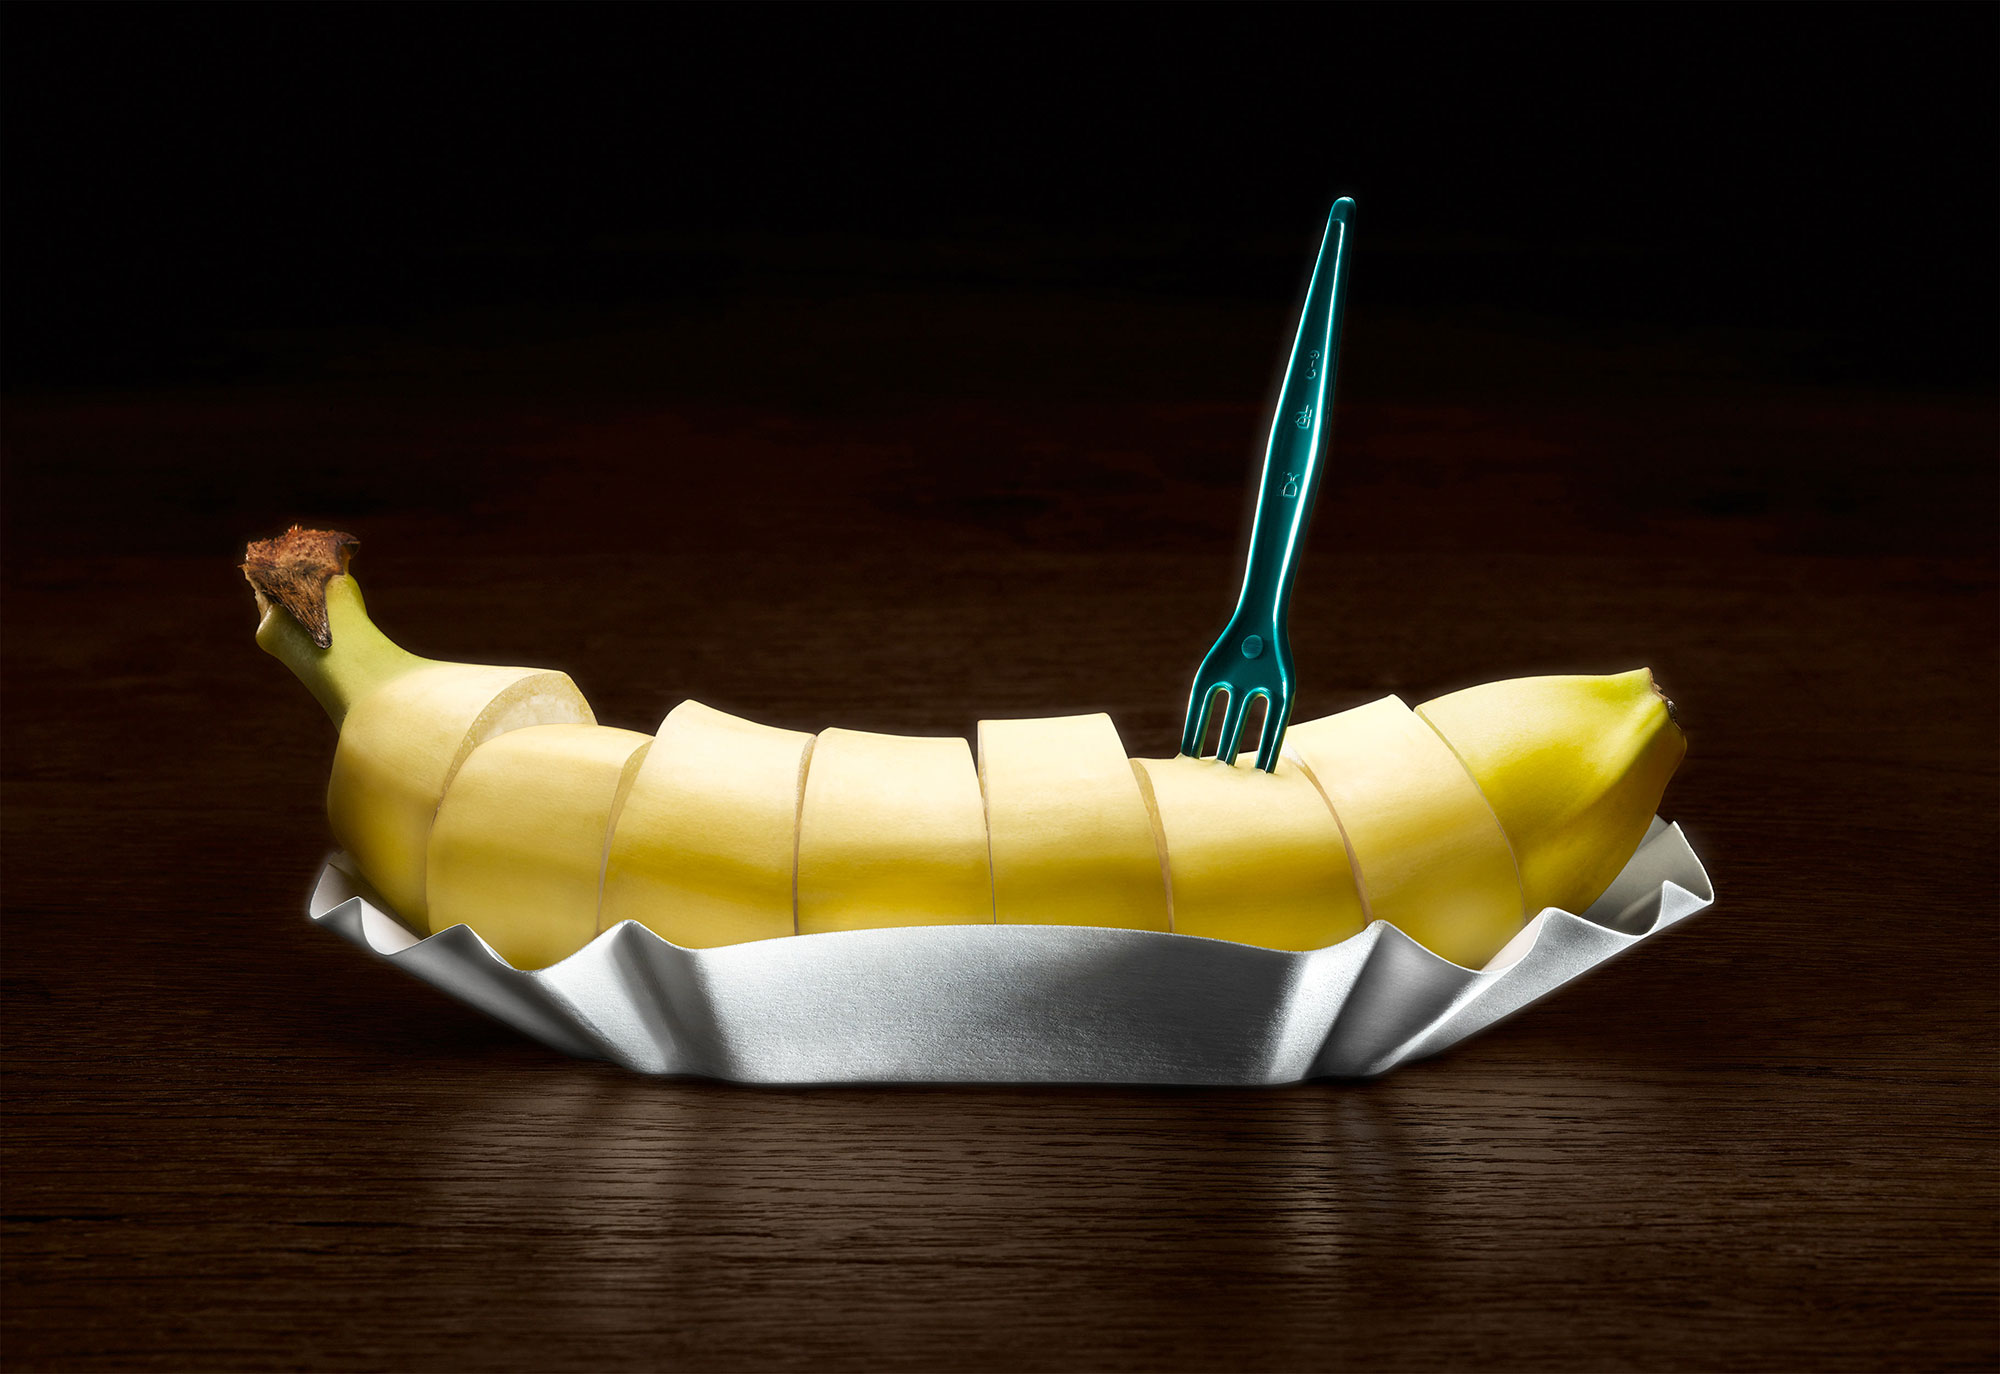 Still life Photographie Fotografie Studio Weilands Wellfood Banane Currywurst Idris Kolodziej